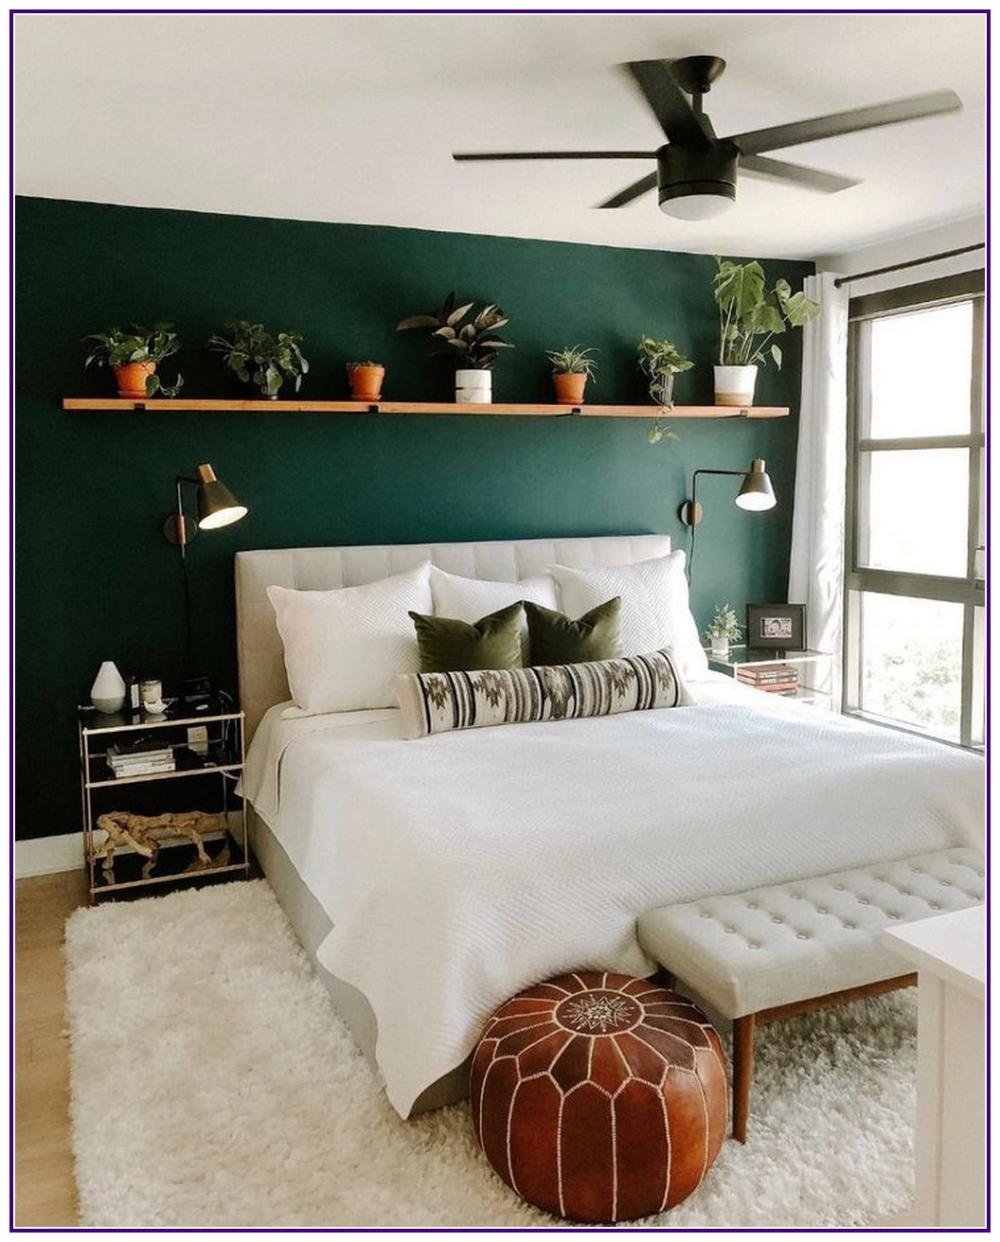 12 Fancy Wall Decor Ideas To Beautify Your Bedroom Aux Pays Des Fleurs Com Bedroom Interior Green Bedroom Walls Bedroom Design